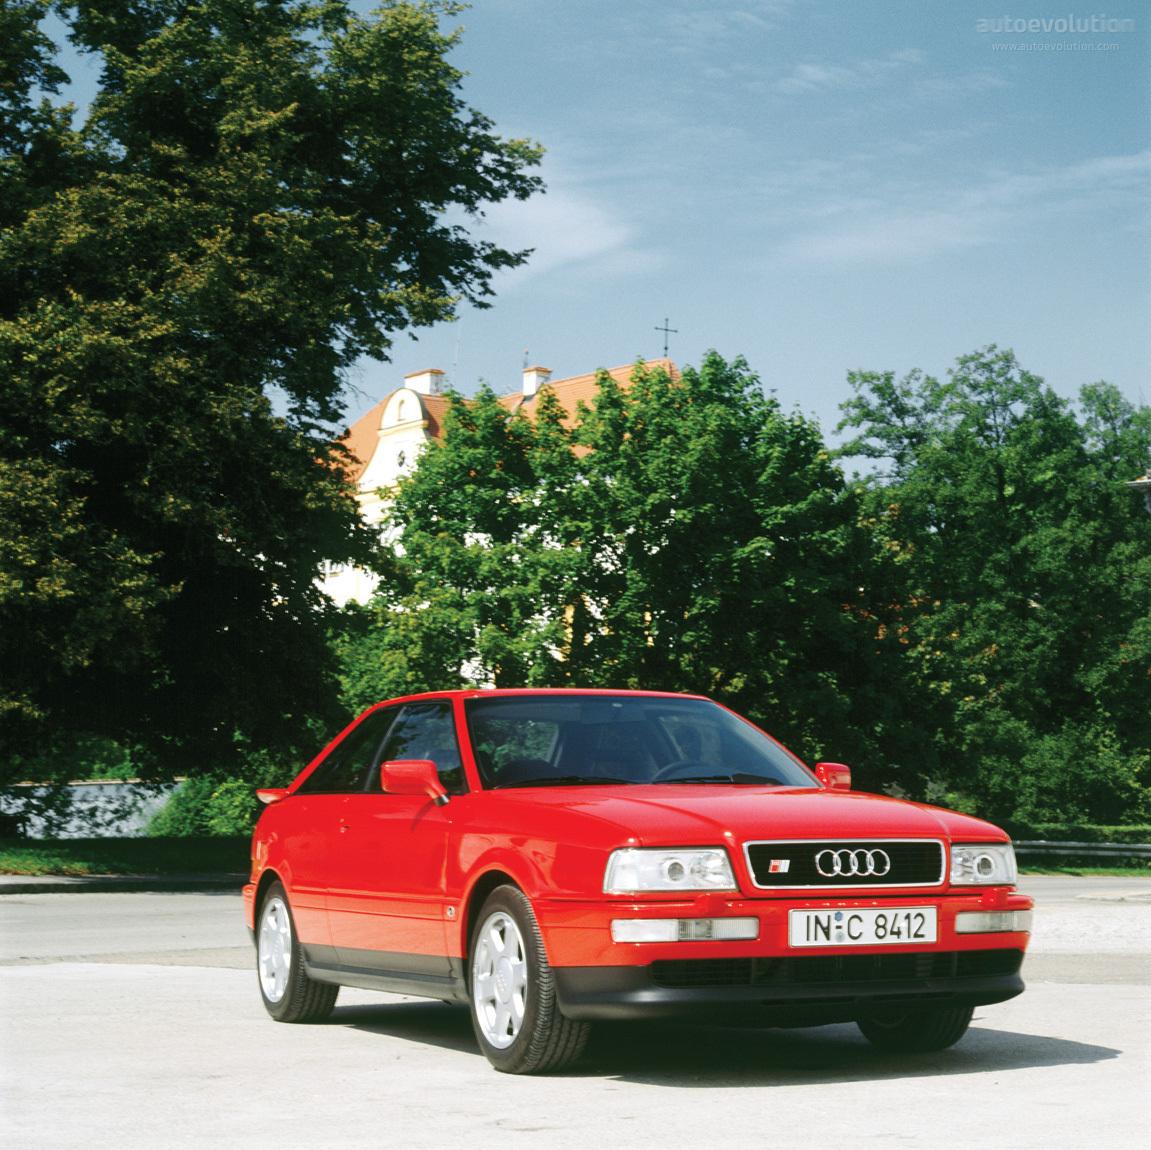 audi coupe s2 quattro specs photos 1990 1991 1992 1993 1994 1995 1996 autoevolution. Black Bedroom Furniture Sets. Home Design Ideas